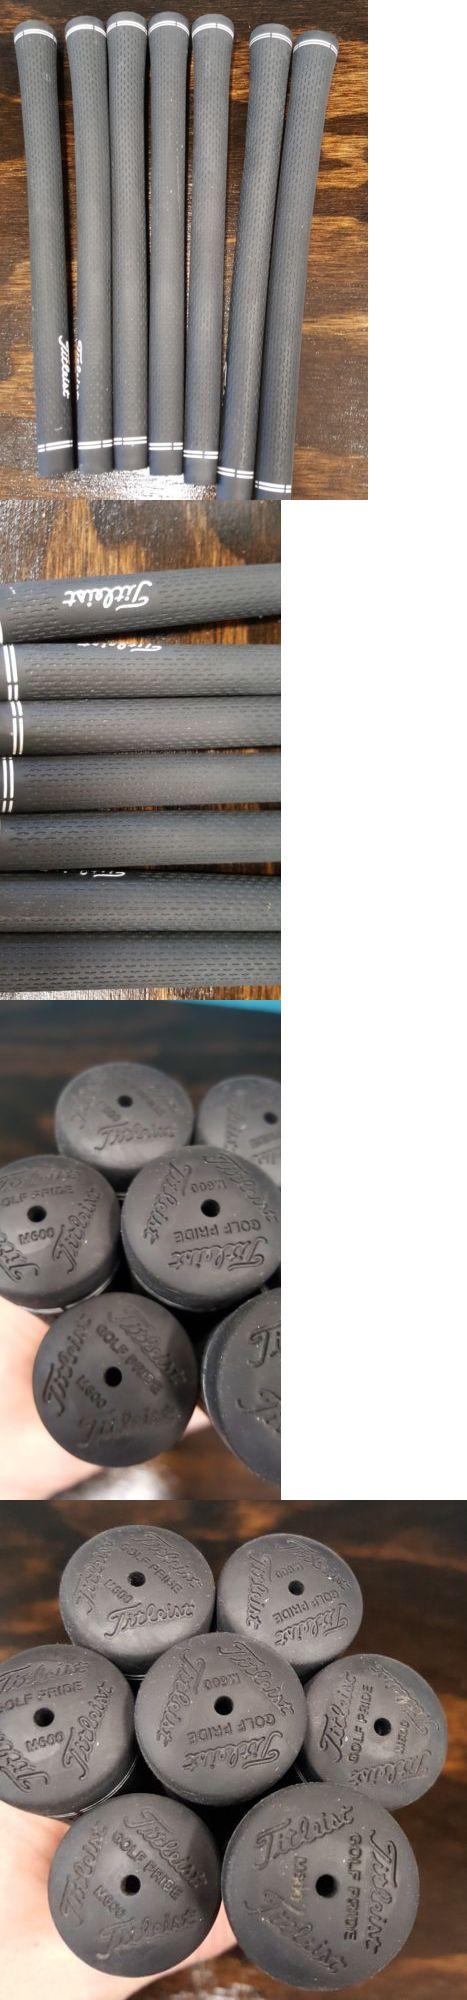 Golf Club Grips 47324: Set Of 7 New Titleist Oem Golf Pride Tour Velvet .60 Grips Golfpride -> BUY IT NOW ONLY: $34.99 on eBay!